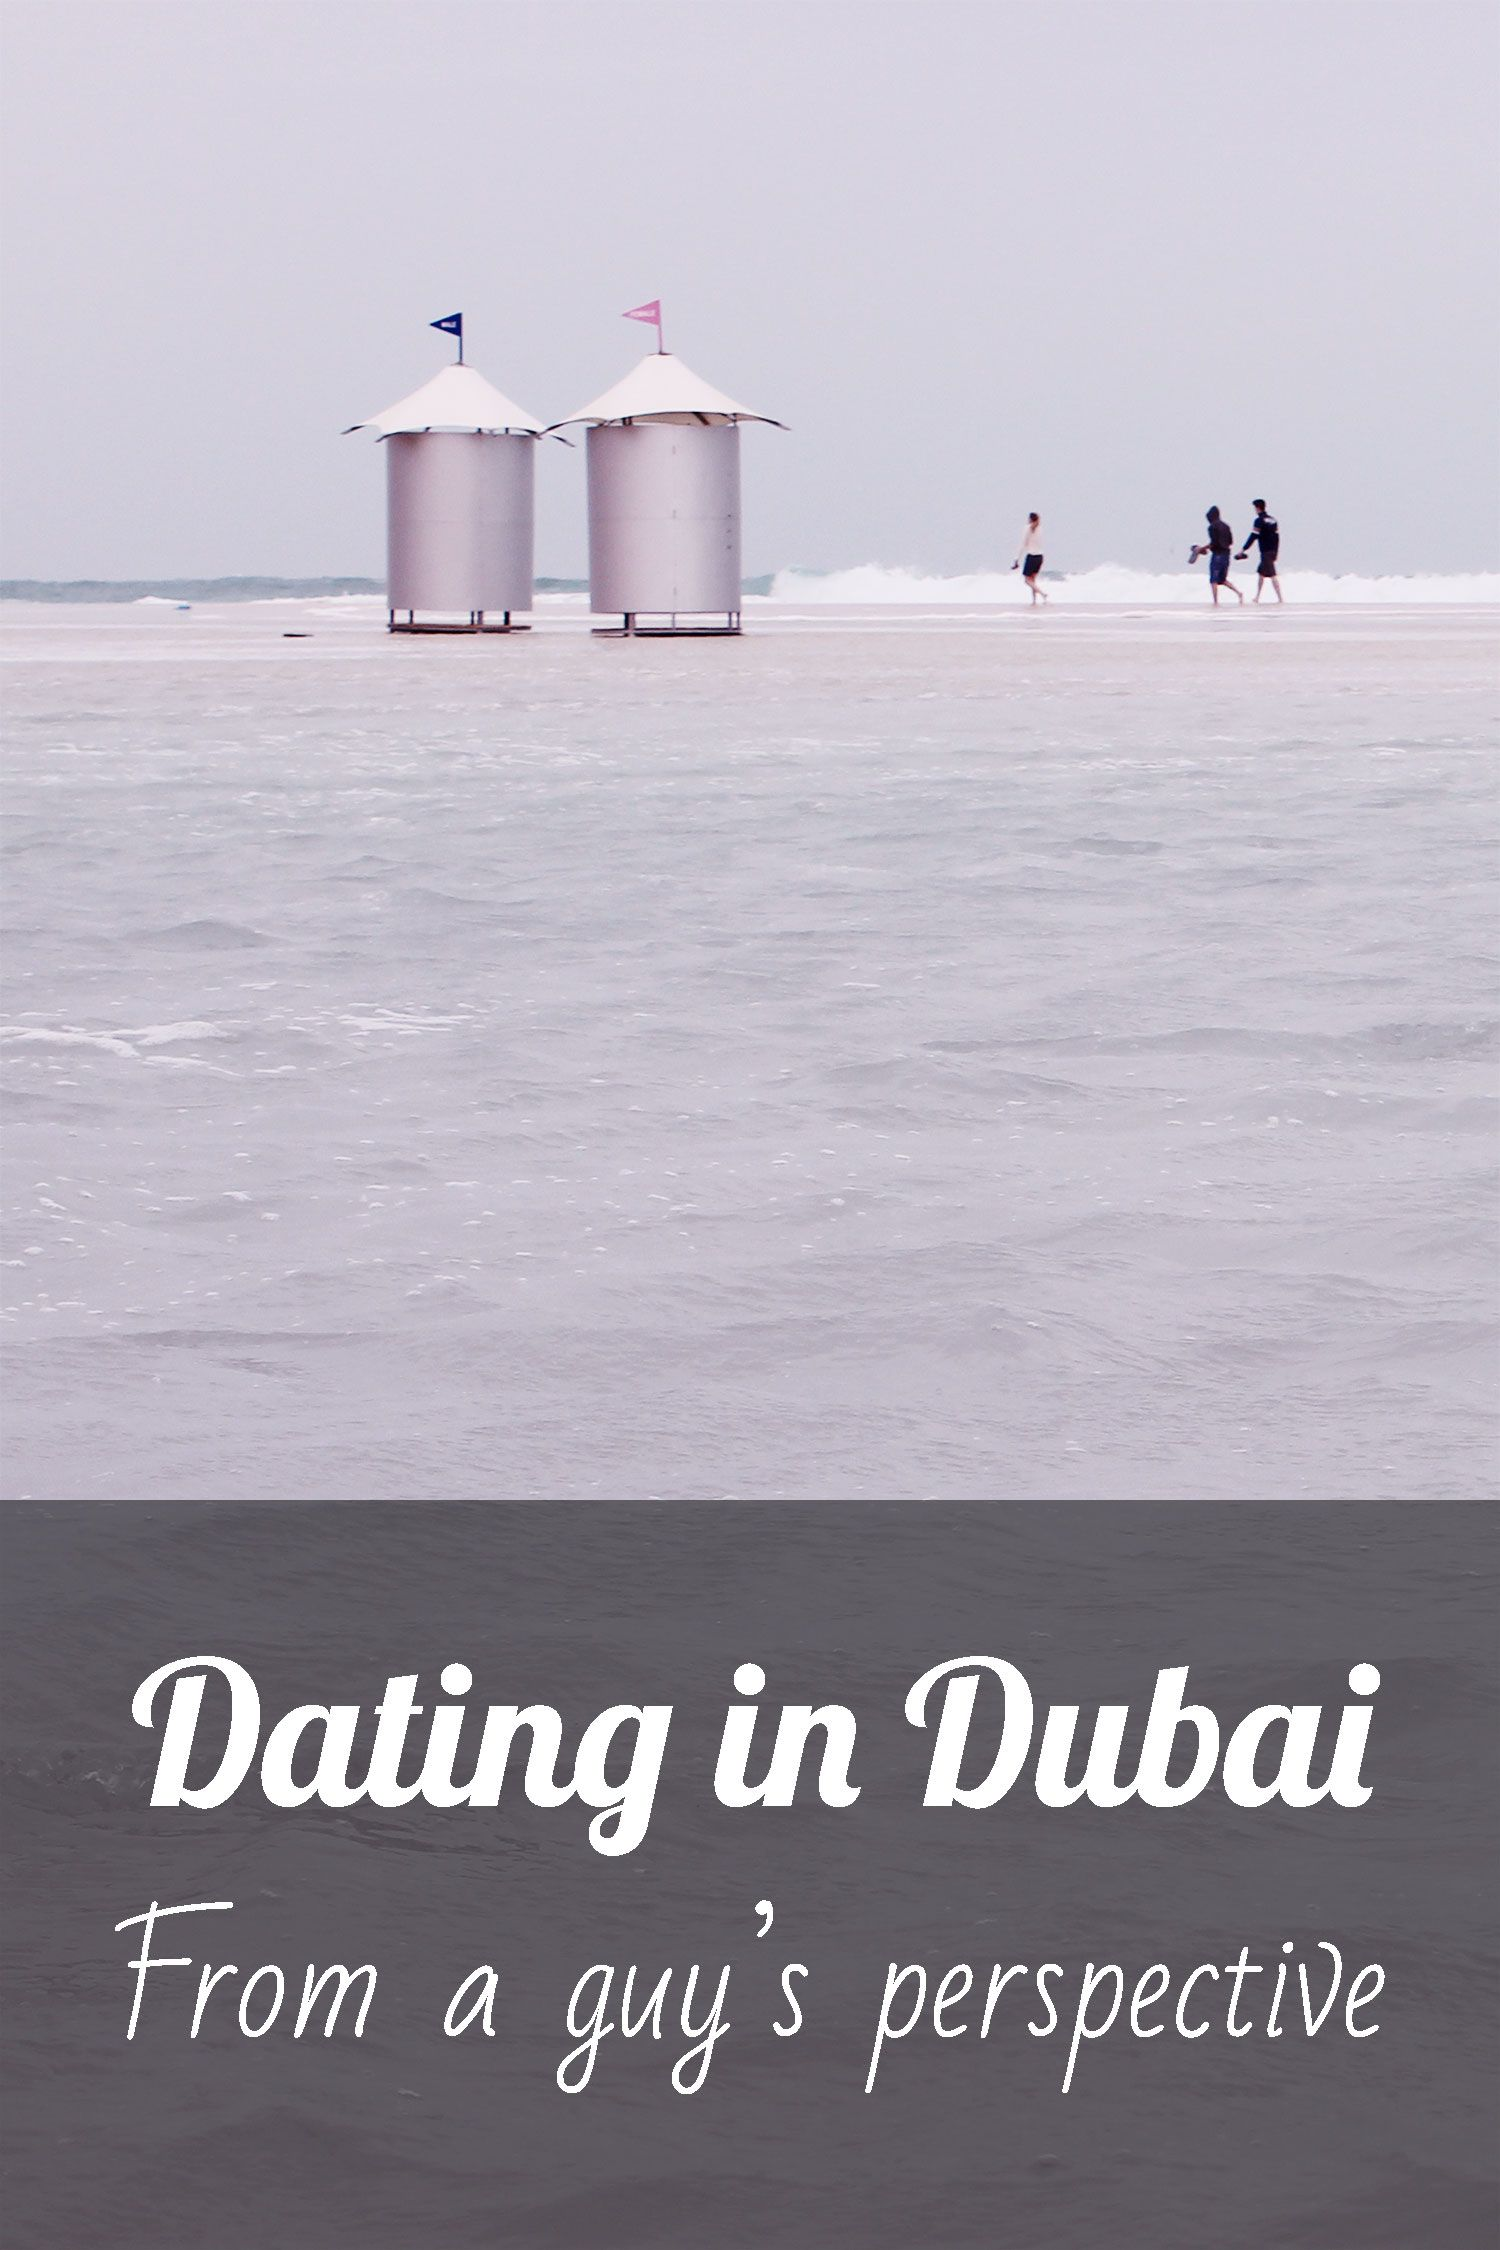 Dating in dubai blog cat osterman dating